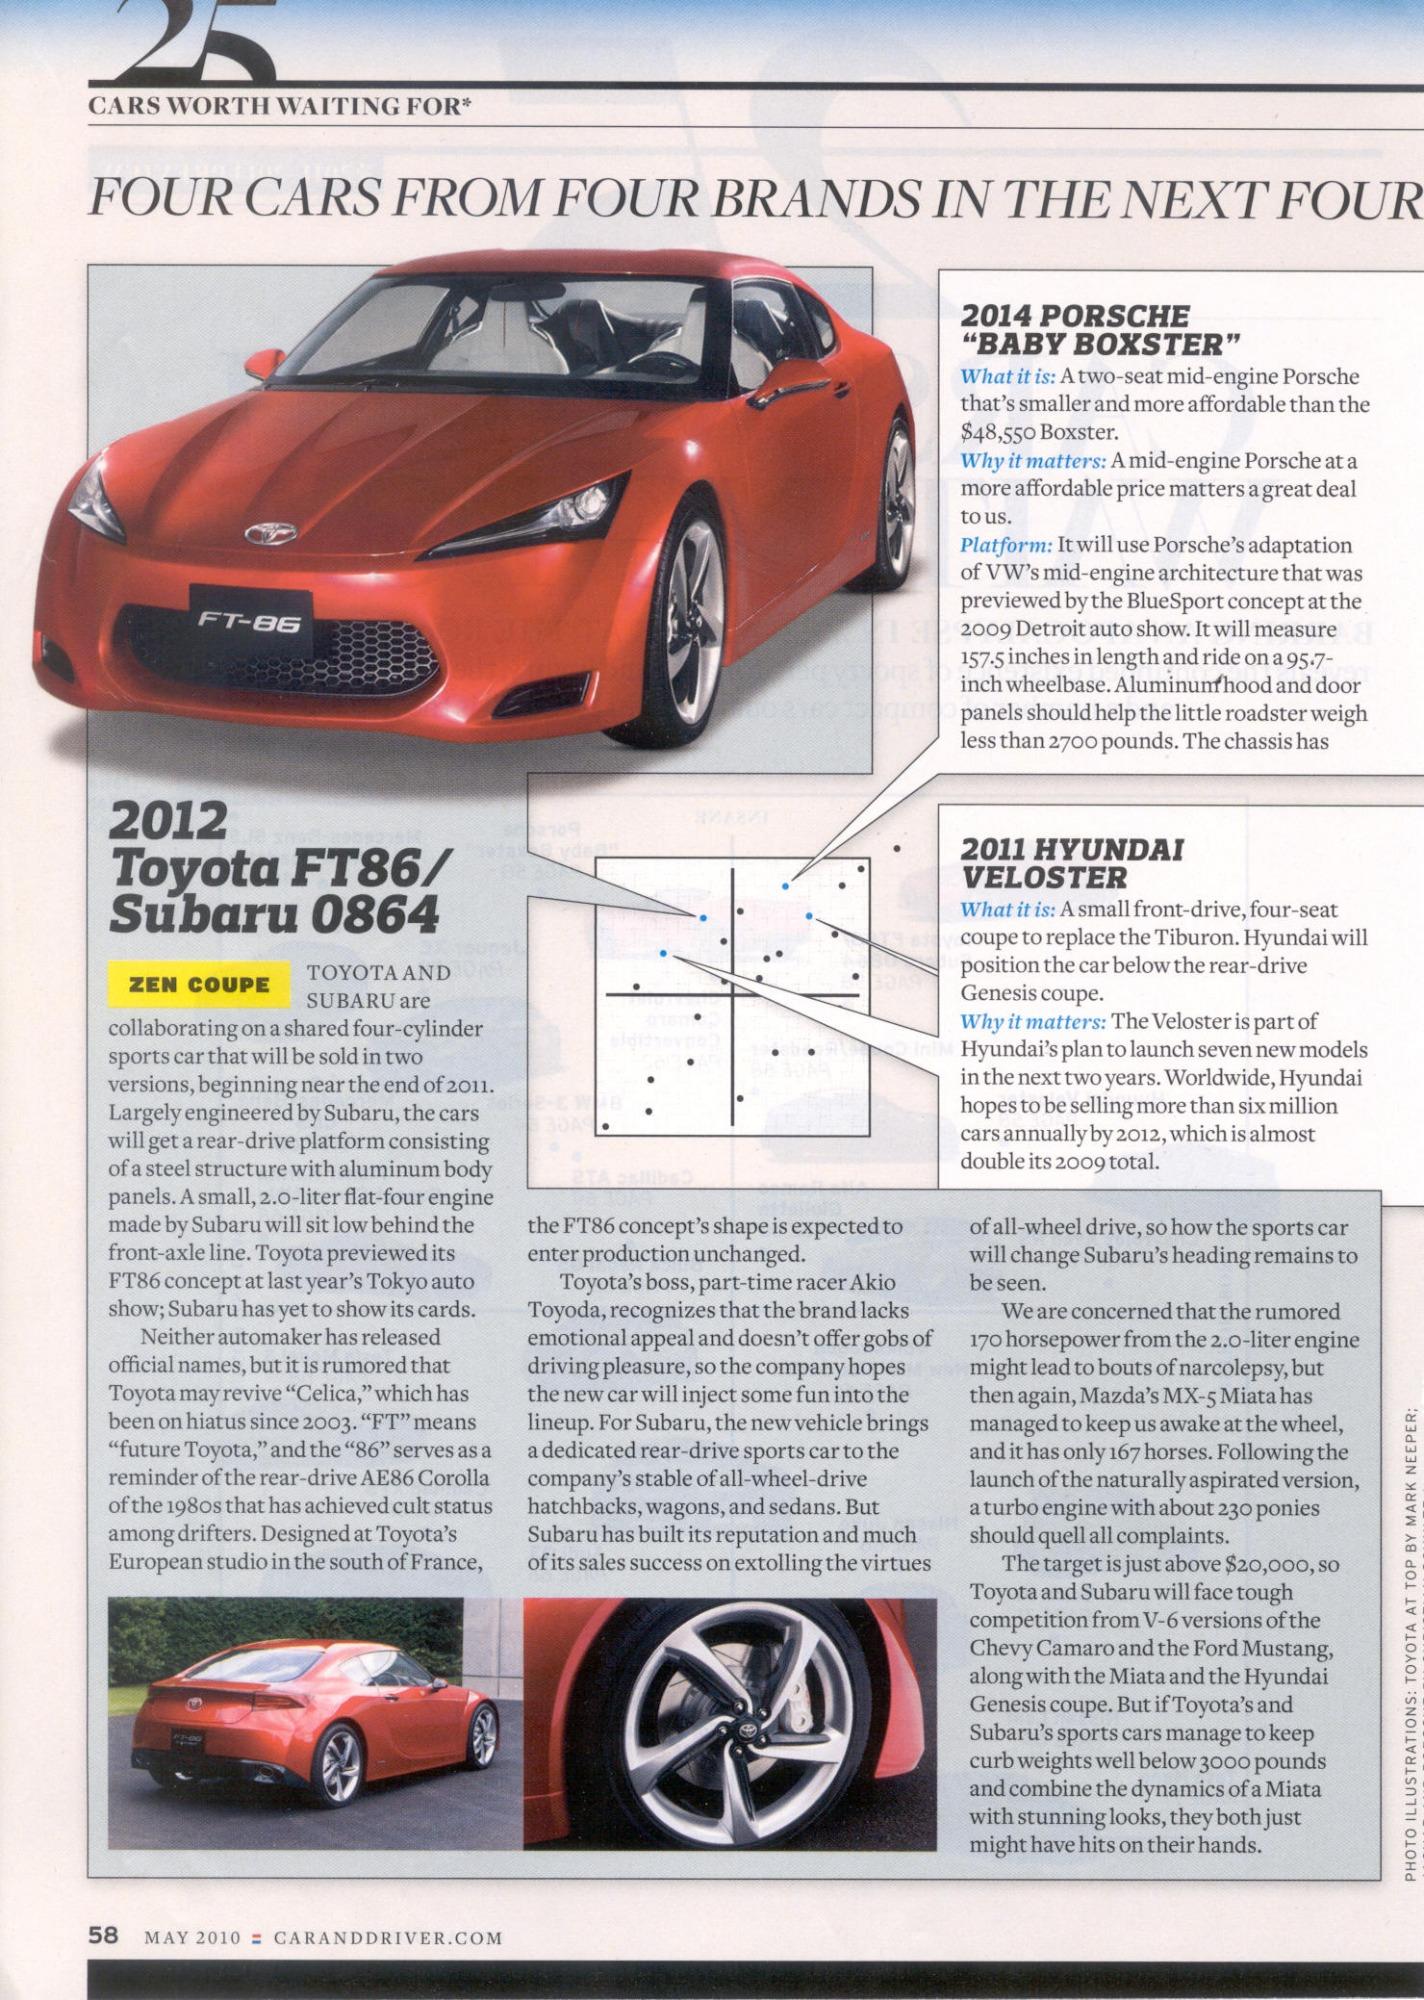 Car U0026 Driver Magazine Inside Scan About FT 86